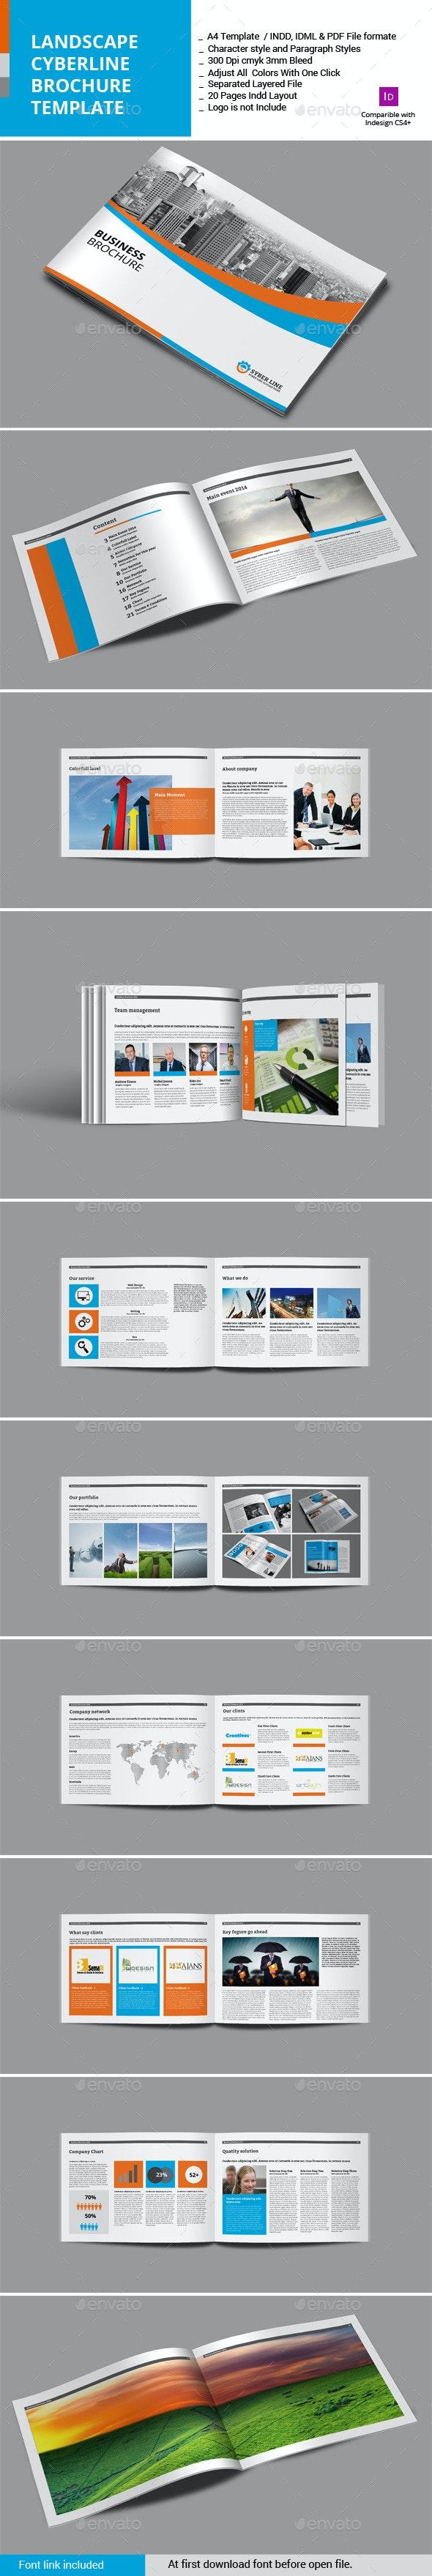 Landscape Syberline Brochure Template - Corporate Brochures